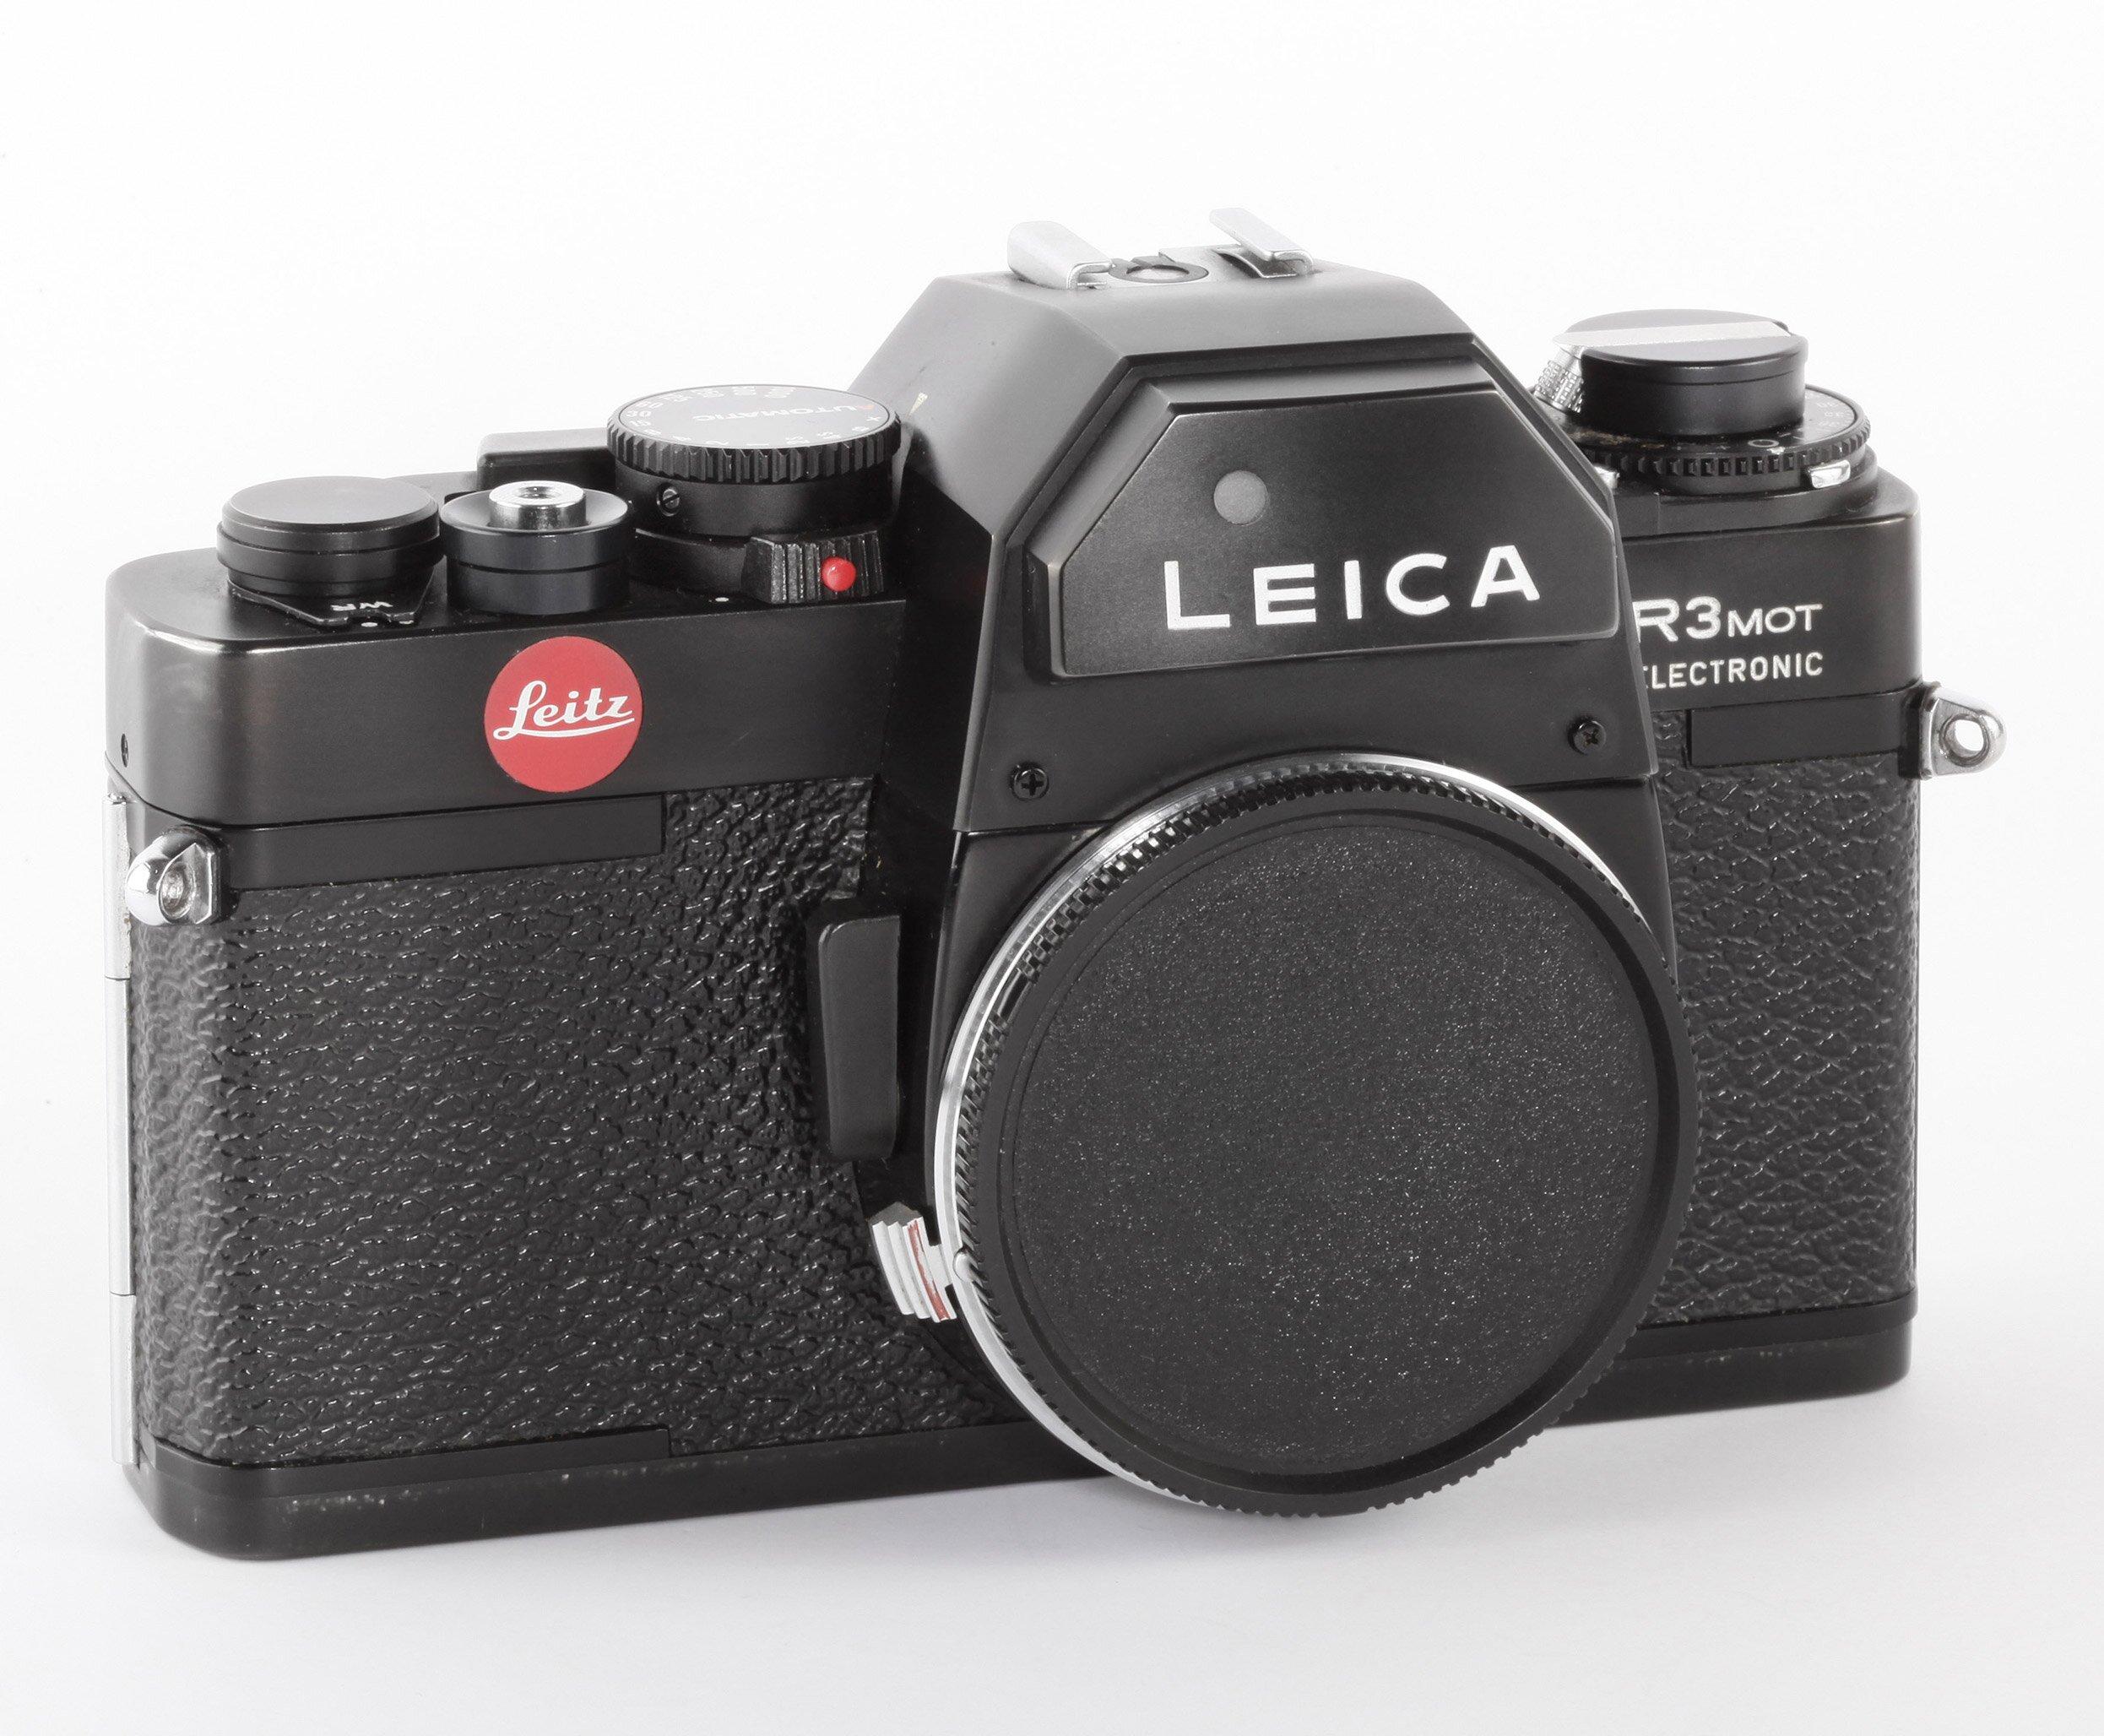 Leica R3 MOT electronic